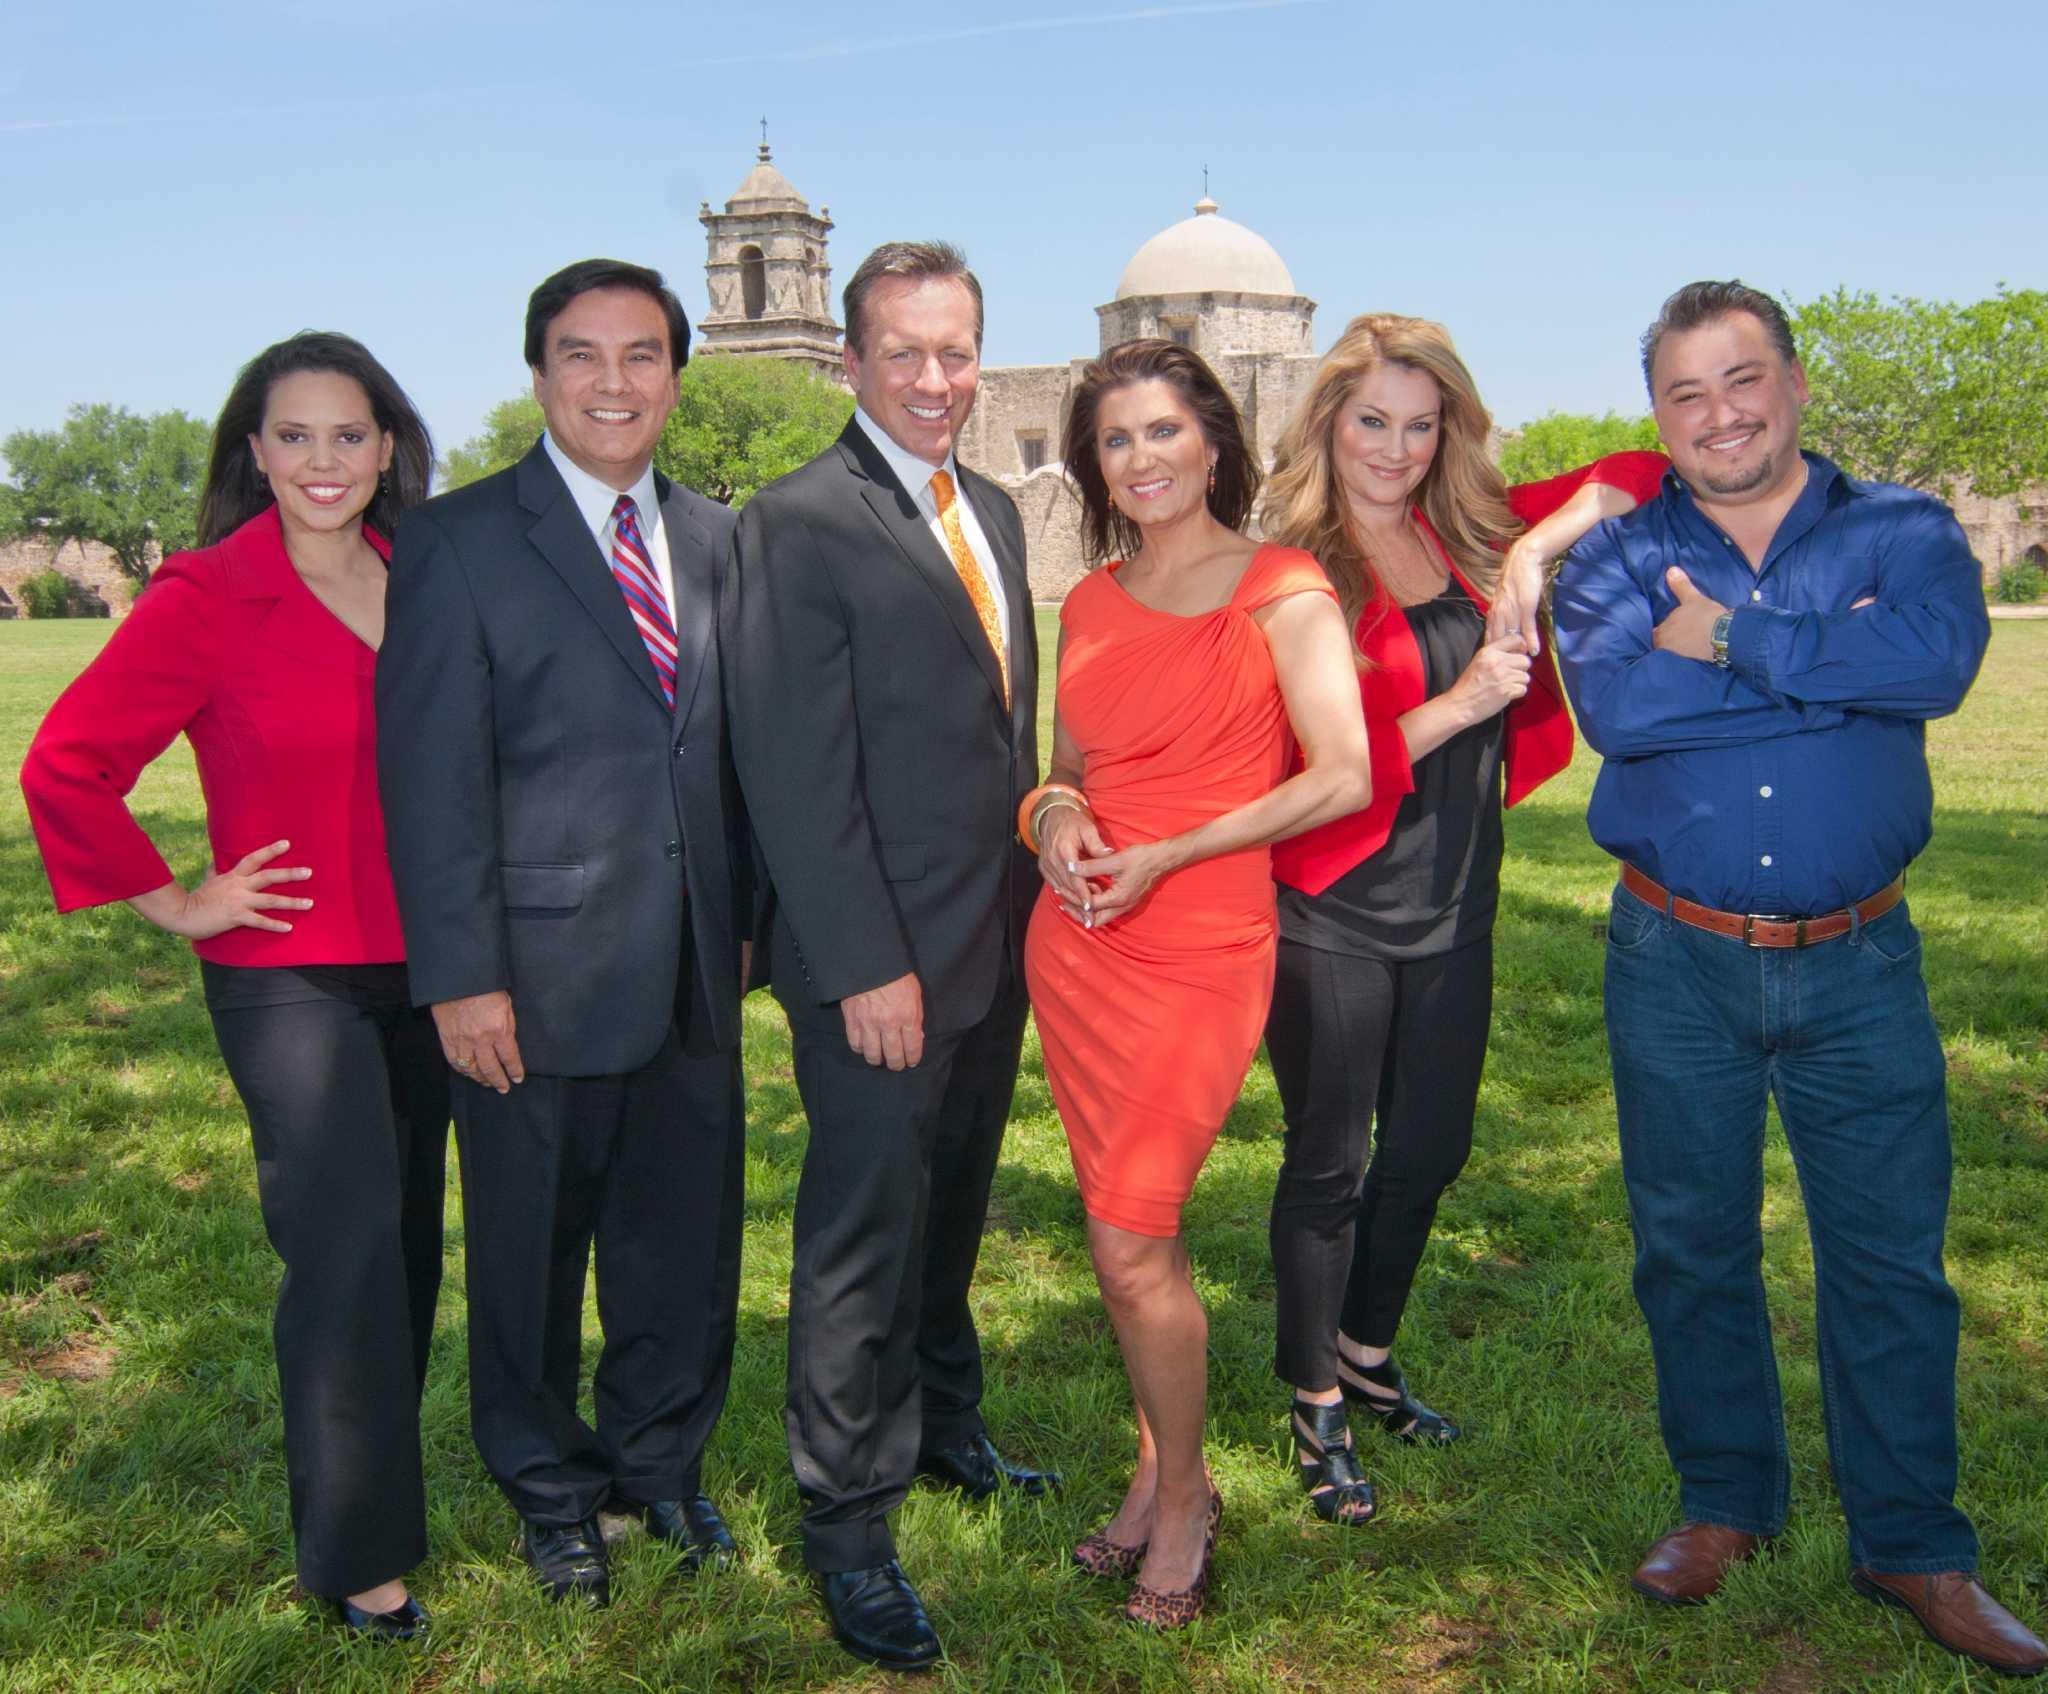 Jakle: Viewers notice co-anchors' changes - San Antonio